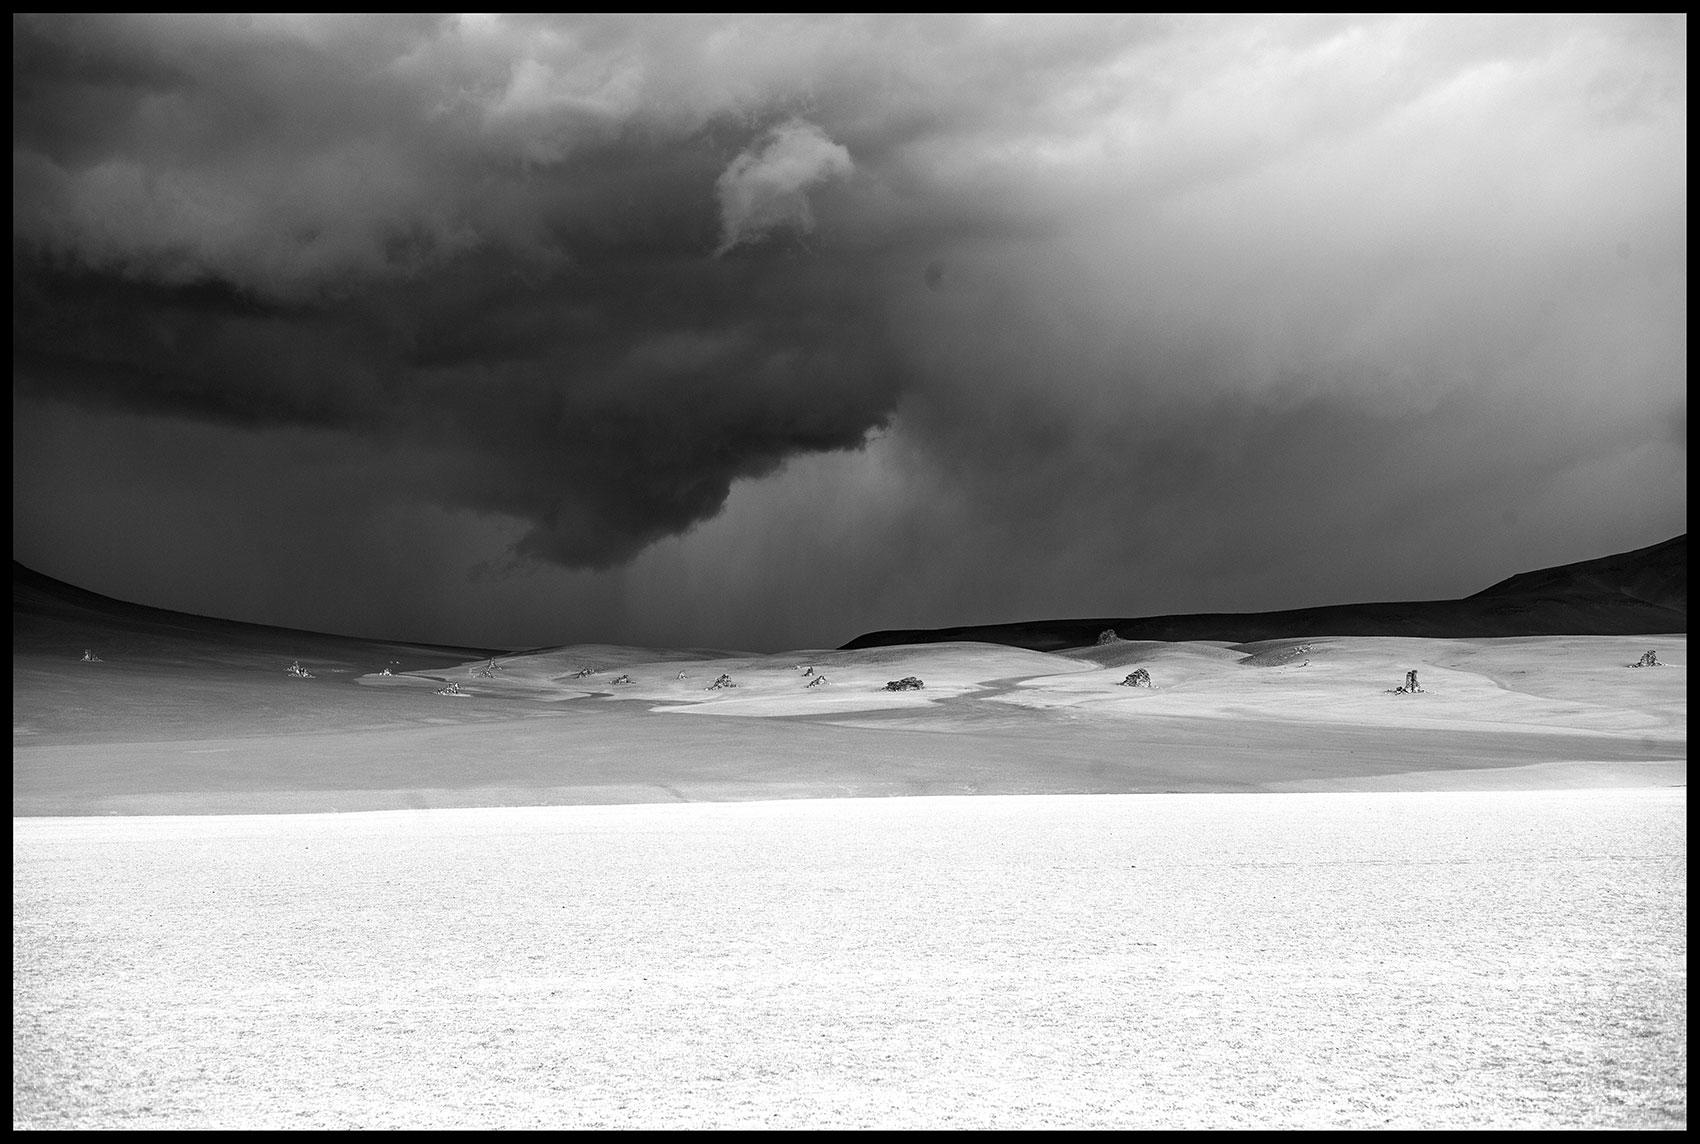 Deserto Dali - Before the Storm | Stefano Paradiso - Photographer